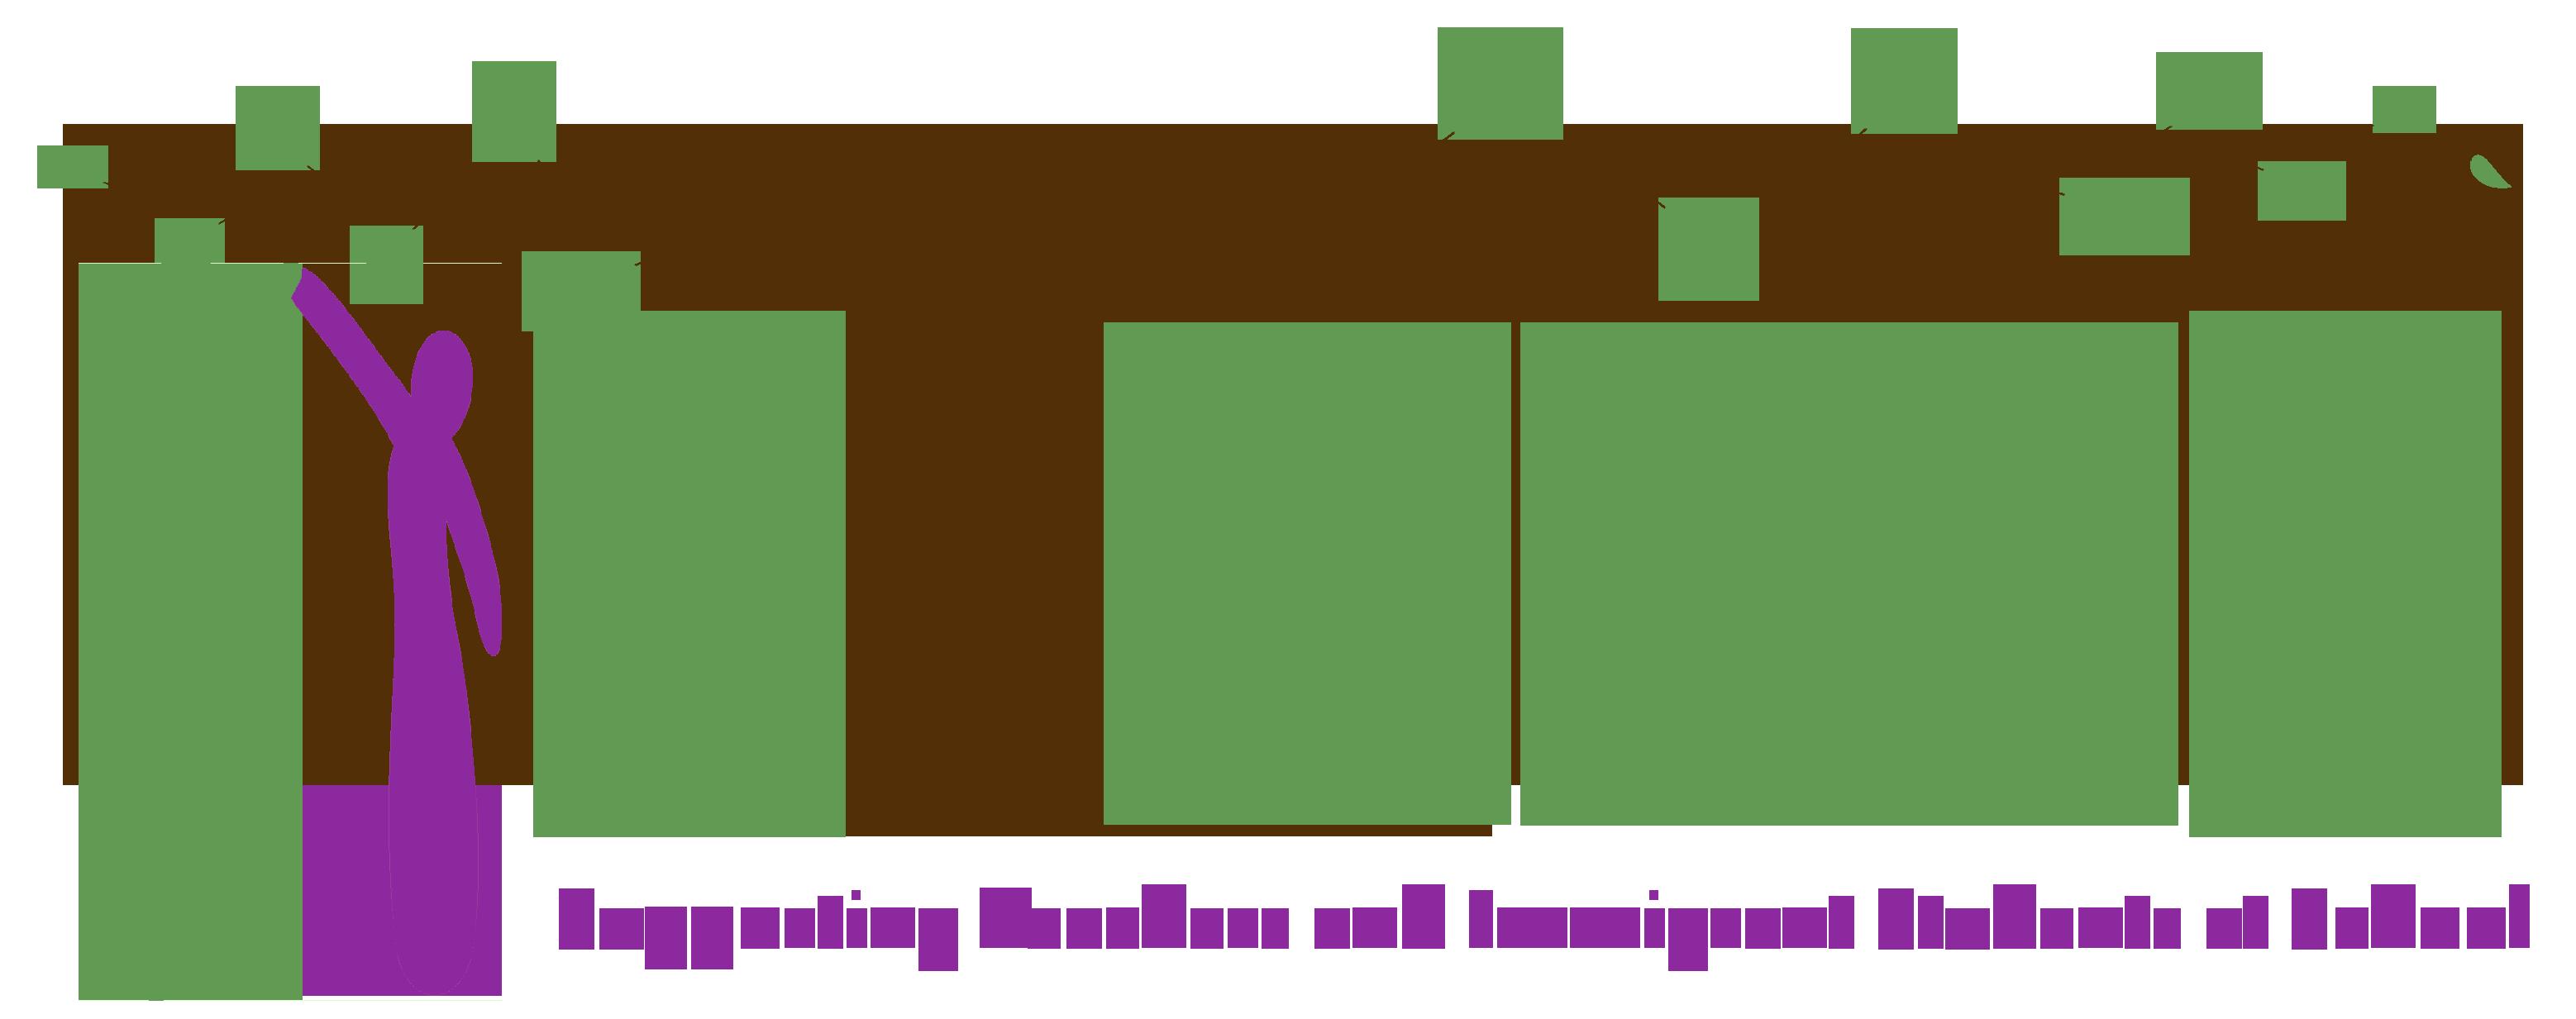 Öğrenci Entegrasyon Programı